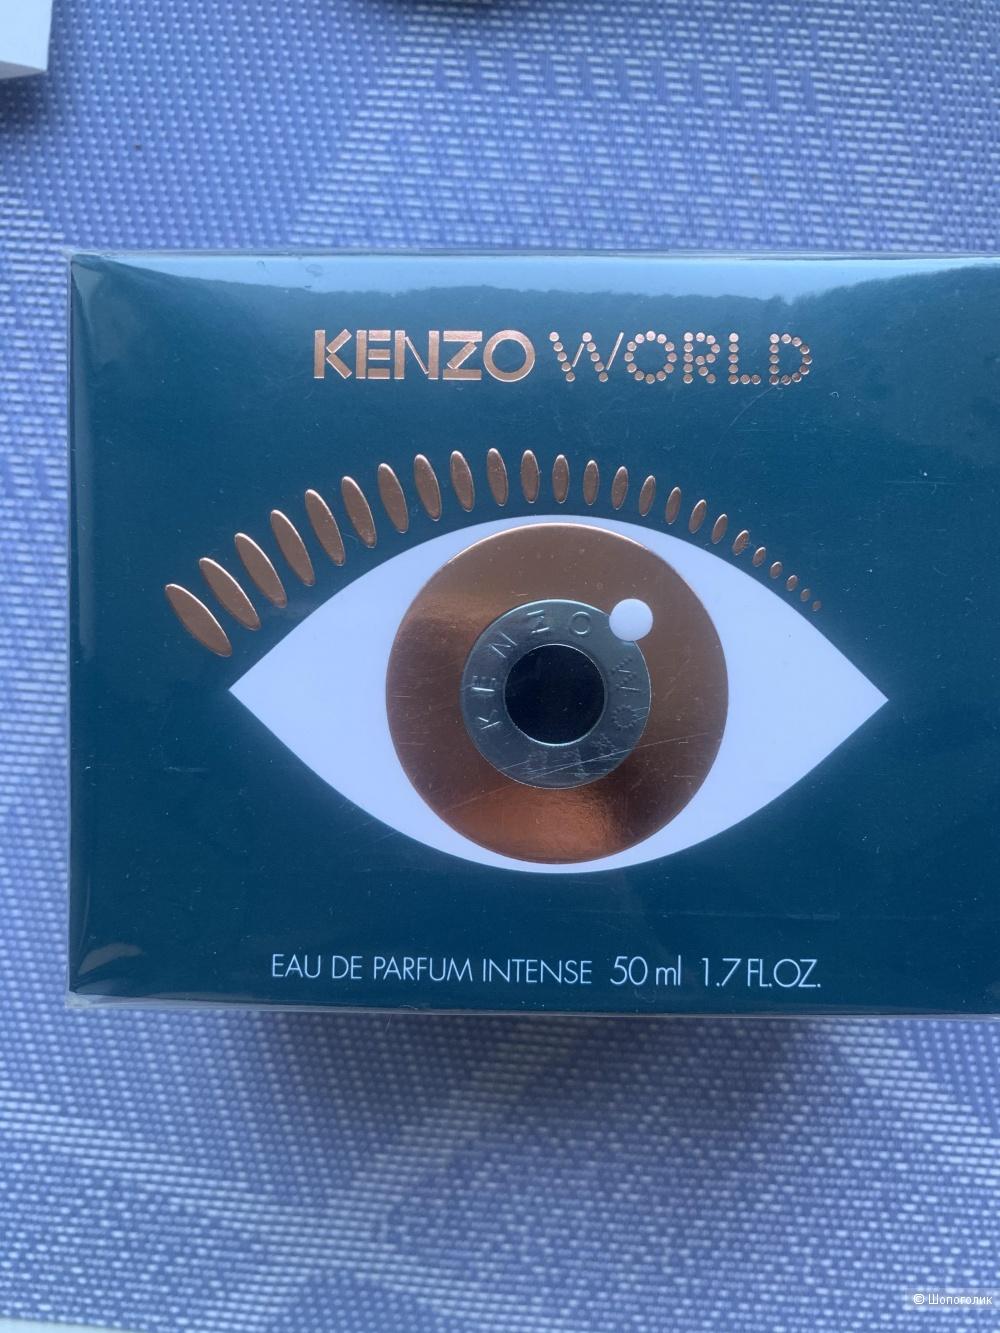 Парфюм Kenzo World edp intense 50ml